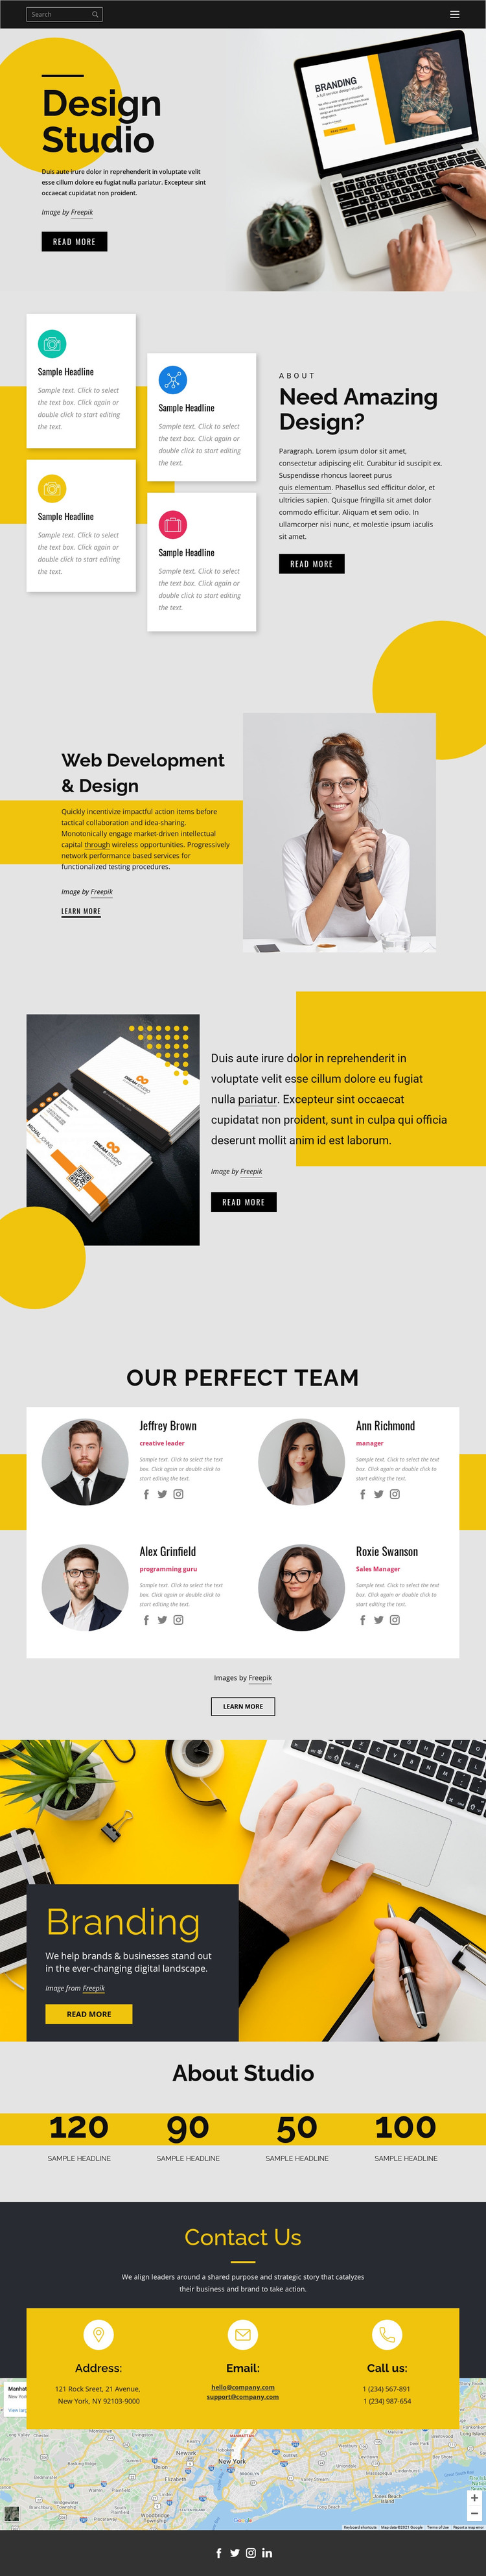 Brand, print & web design Web Design